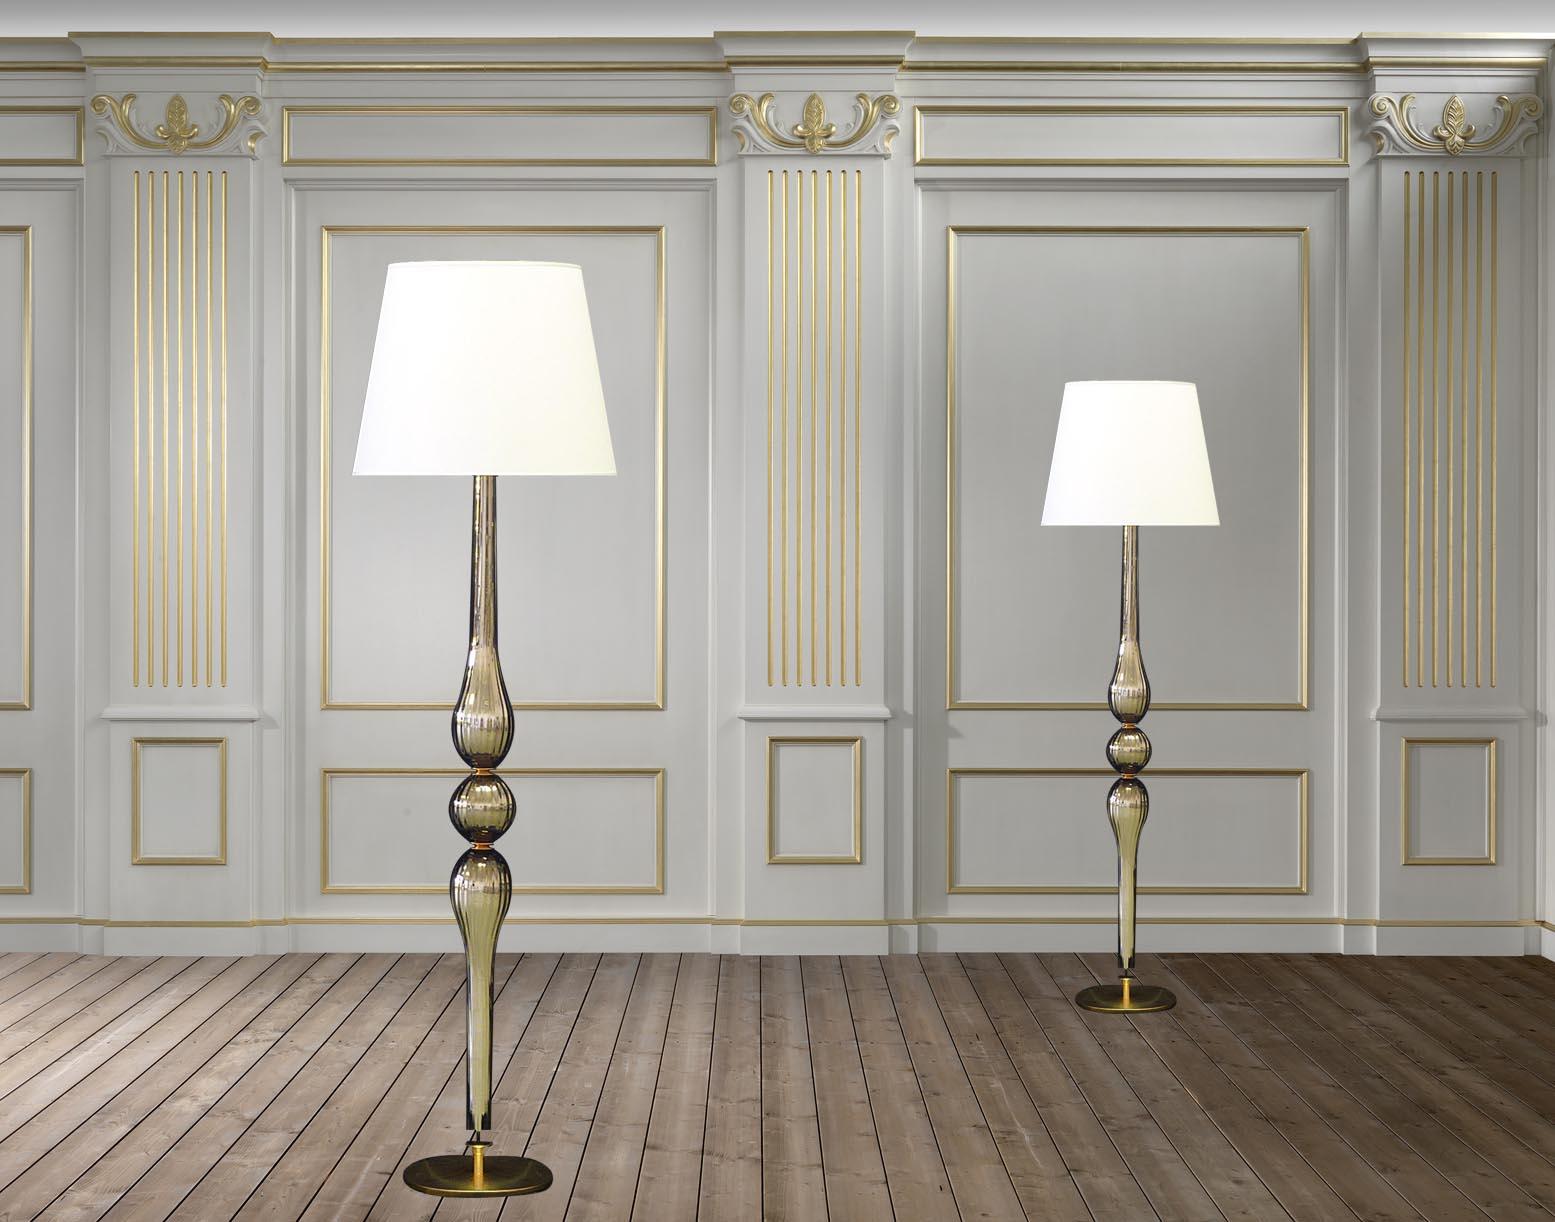 Lampade In Vetro Di Murano Moderne : Lampada da terra moderna royal in vetro di murano lucevetro